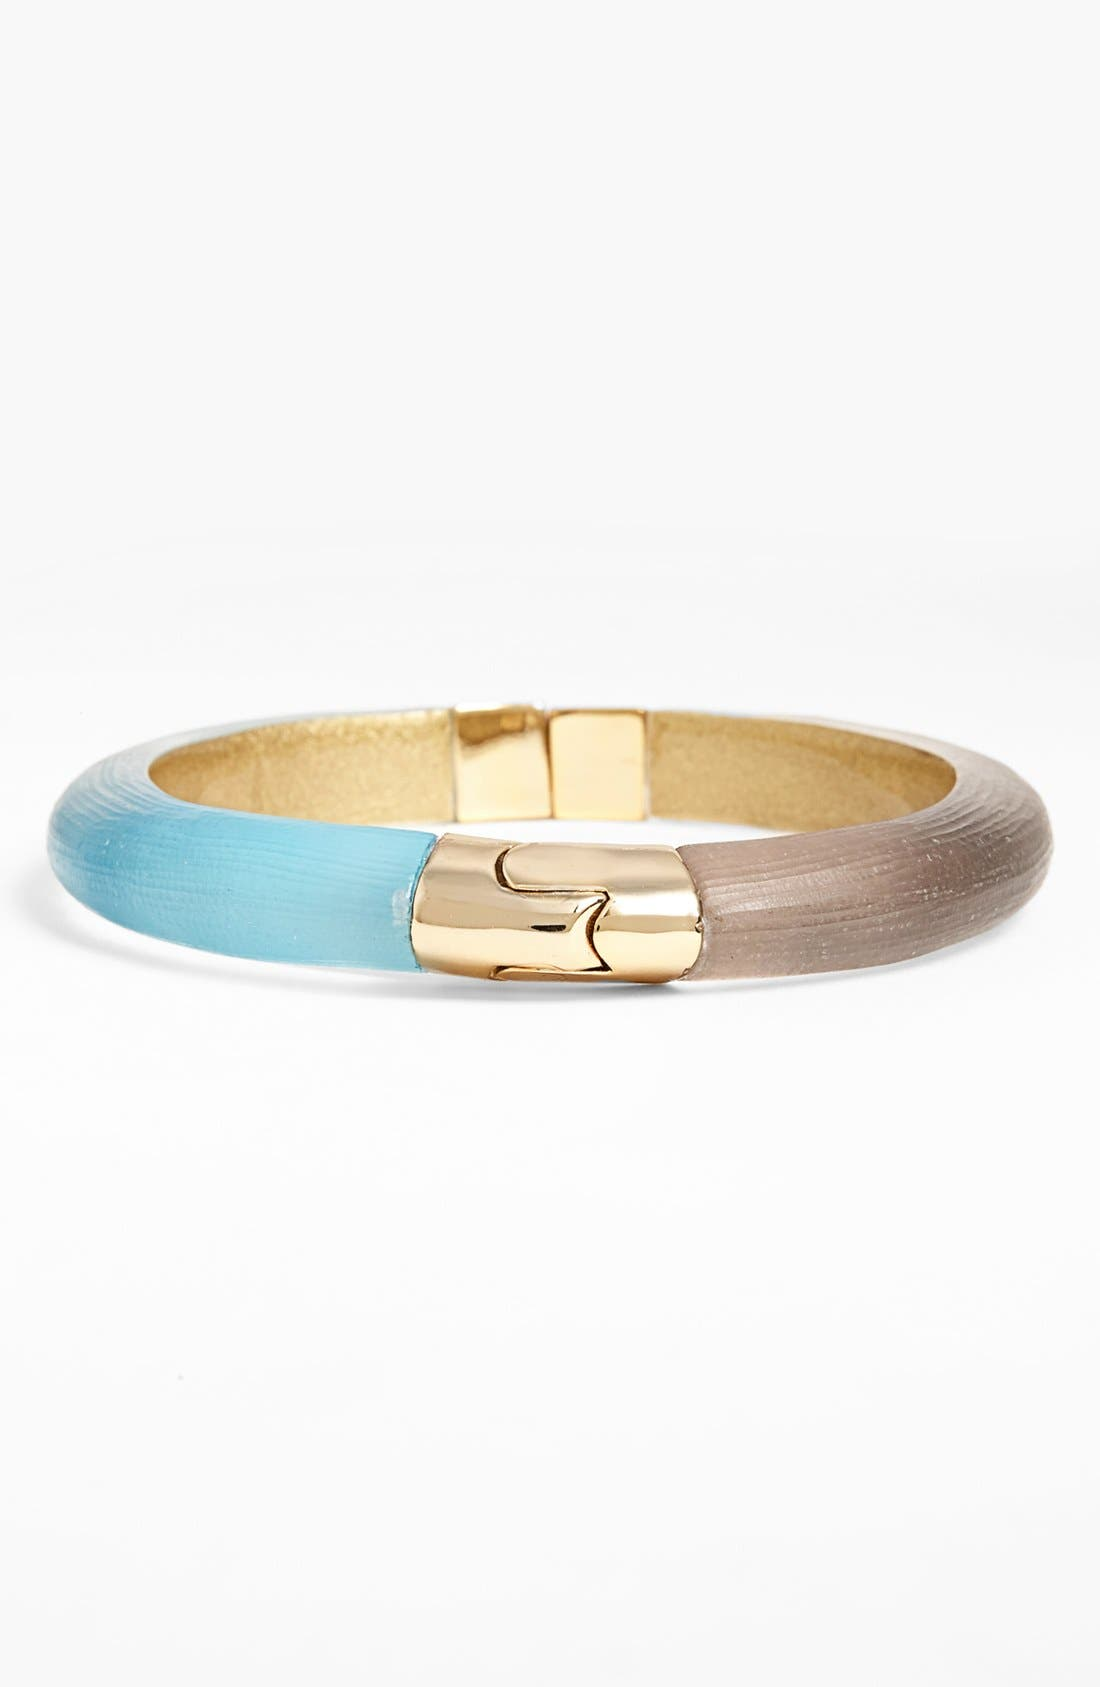 Main Image - Alexis Bittar Lucite® Hinged Bangle Bracelet